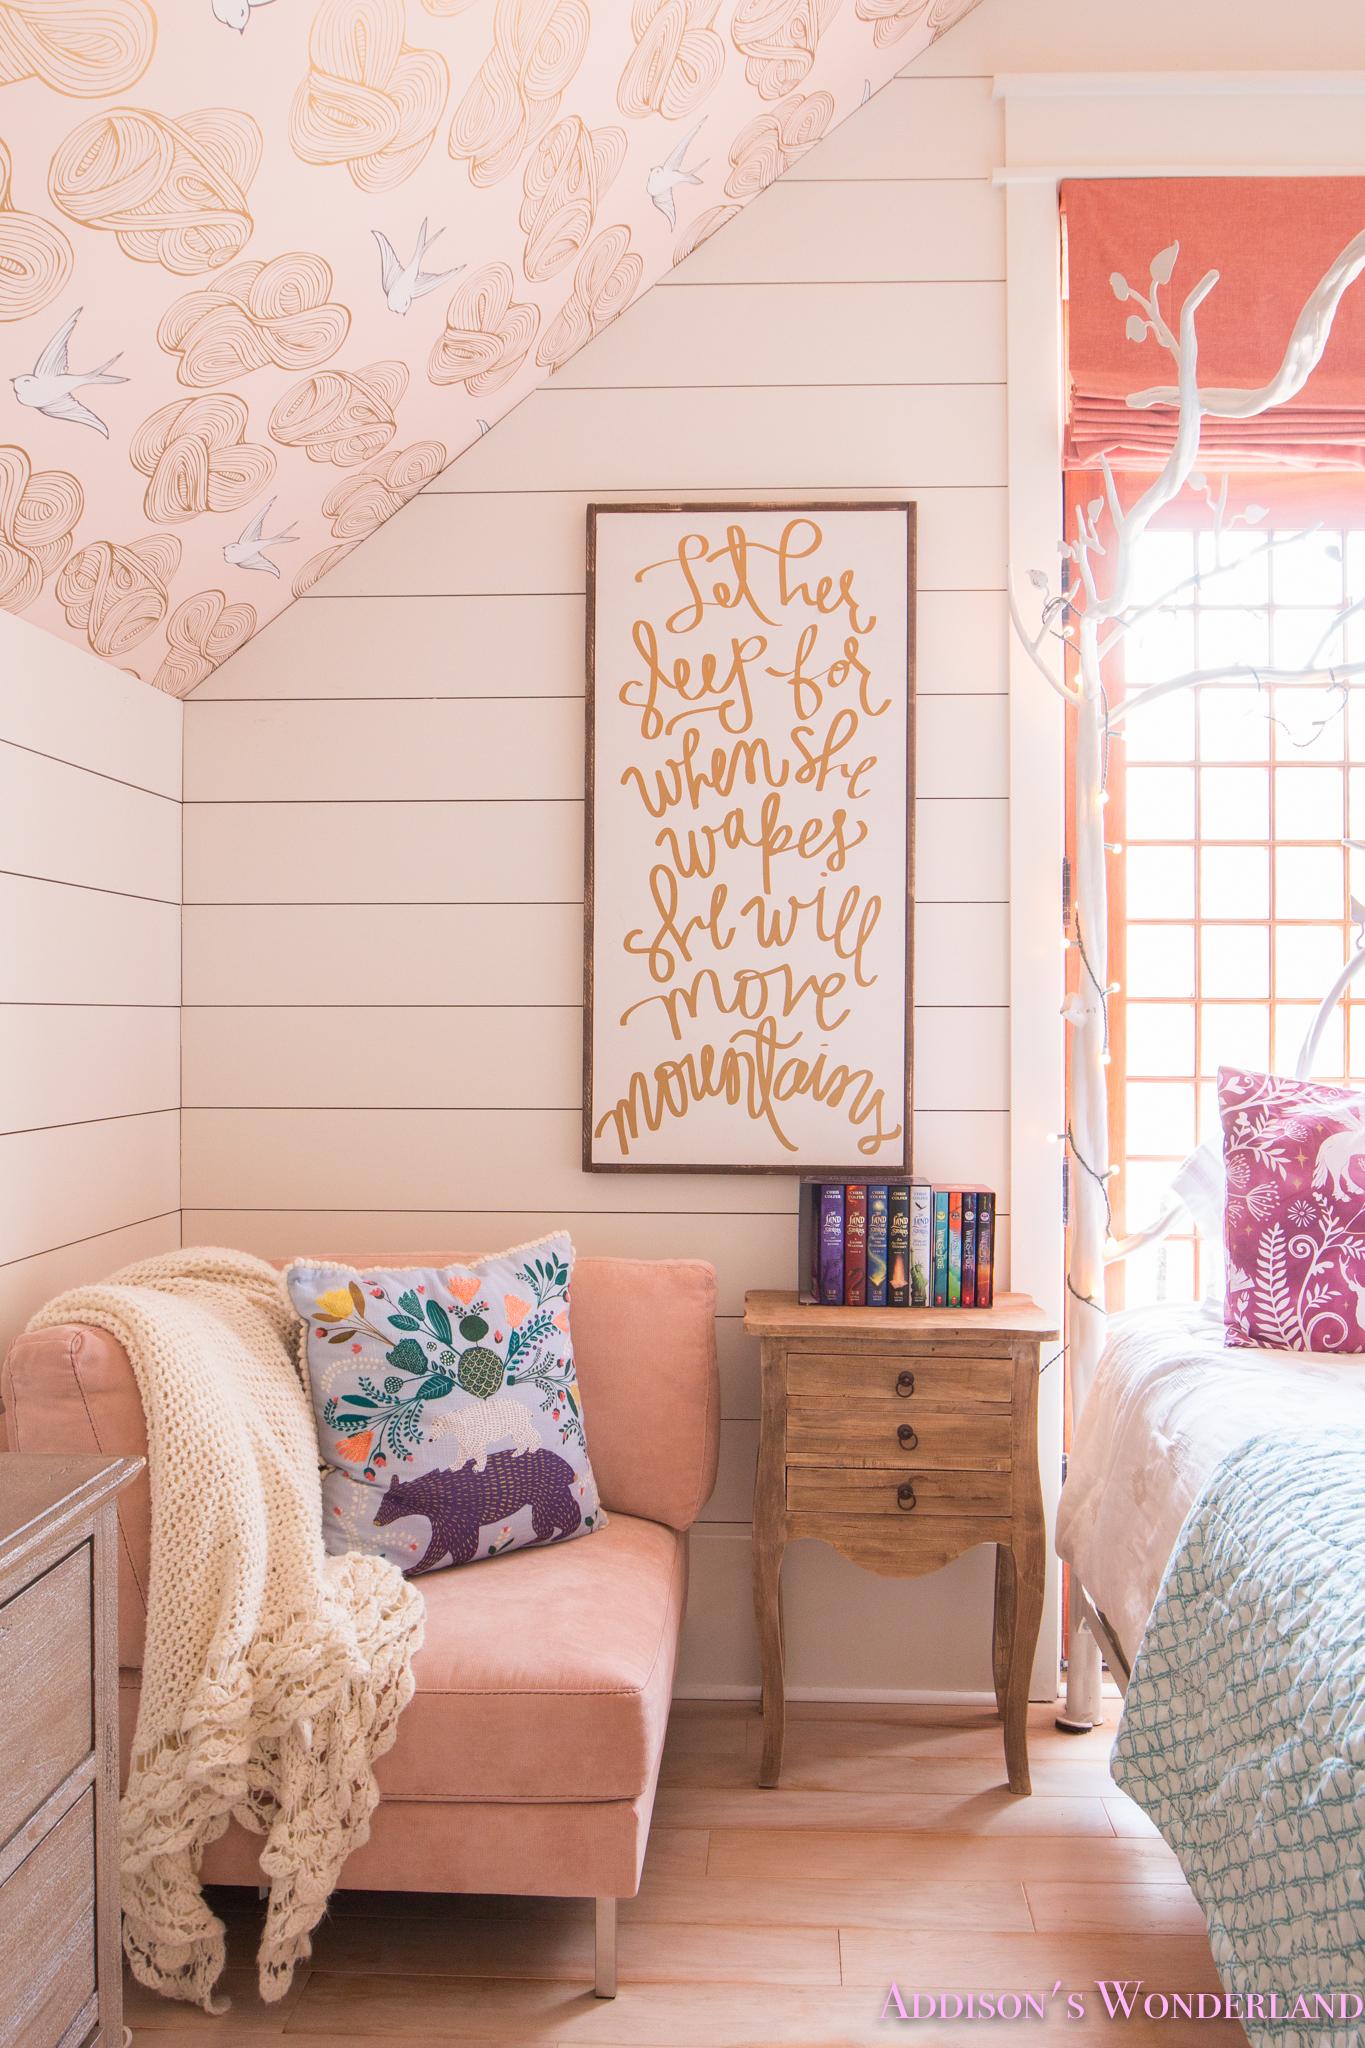 harry potter themed wallpaper,room,pink,furniture,interior design,wall